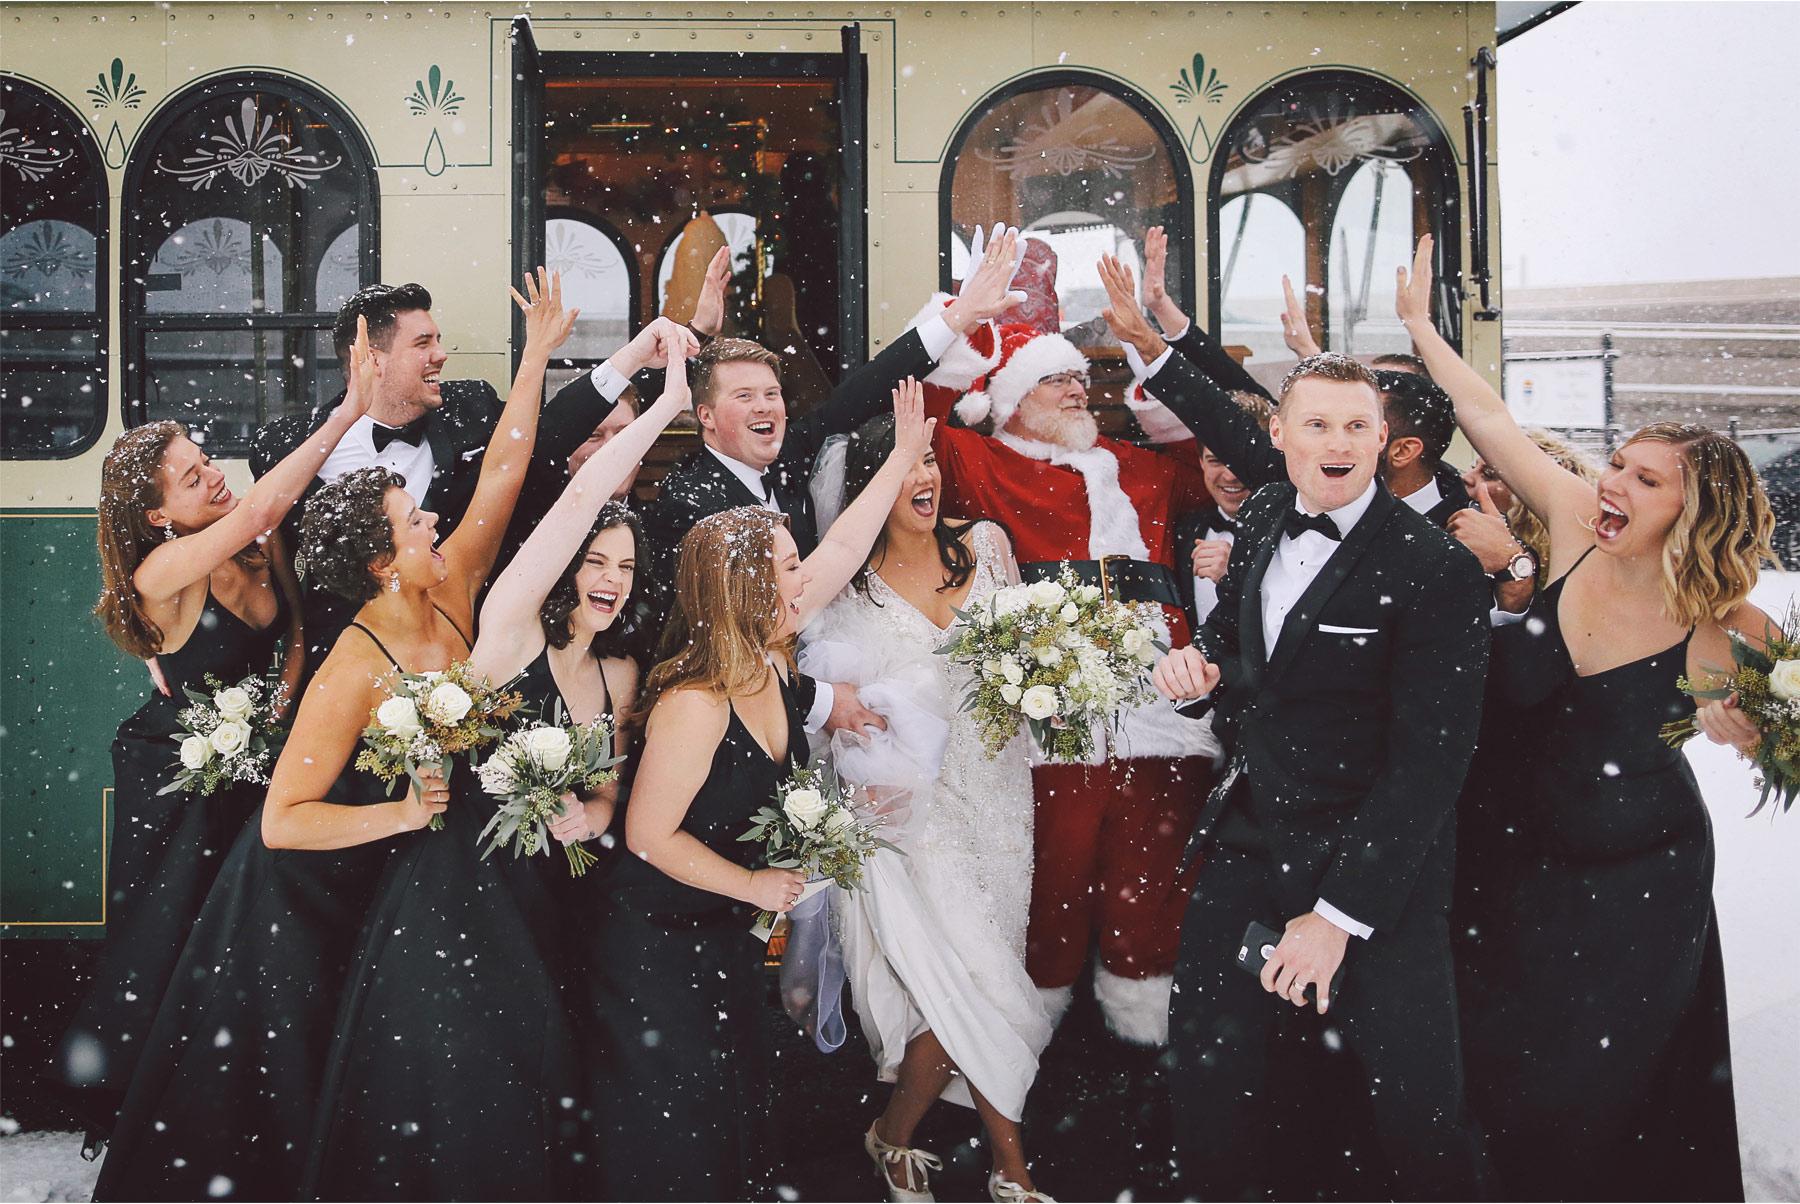 17-Saint-Paul-Minnesota-Wedding-Photography-by-Vick-Photography-Wedding-Party-Group-Trolley-Snow-Storm-Santa-Winter-Wedding-Sami-and-Nick.jpg